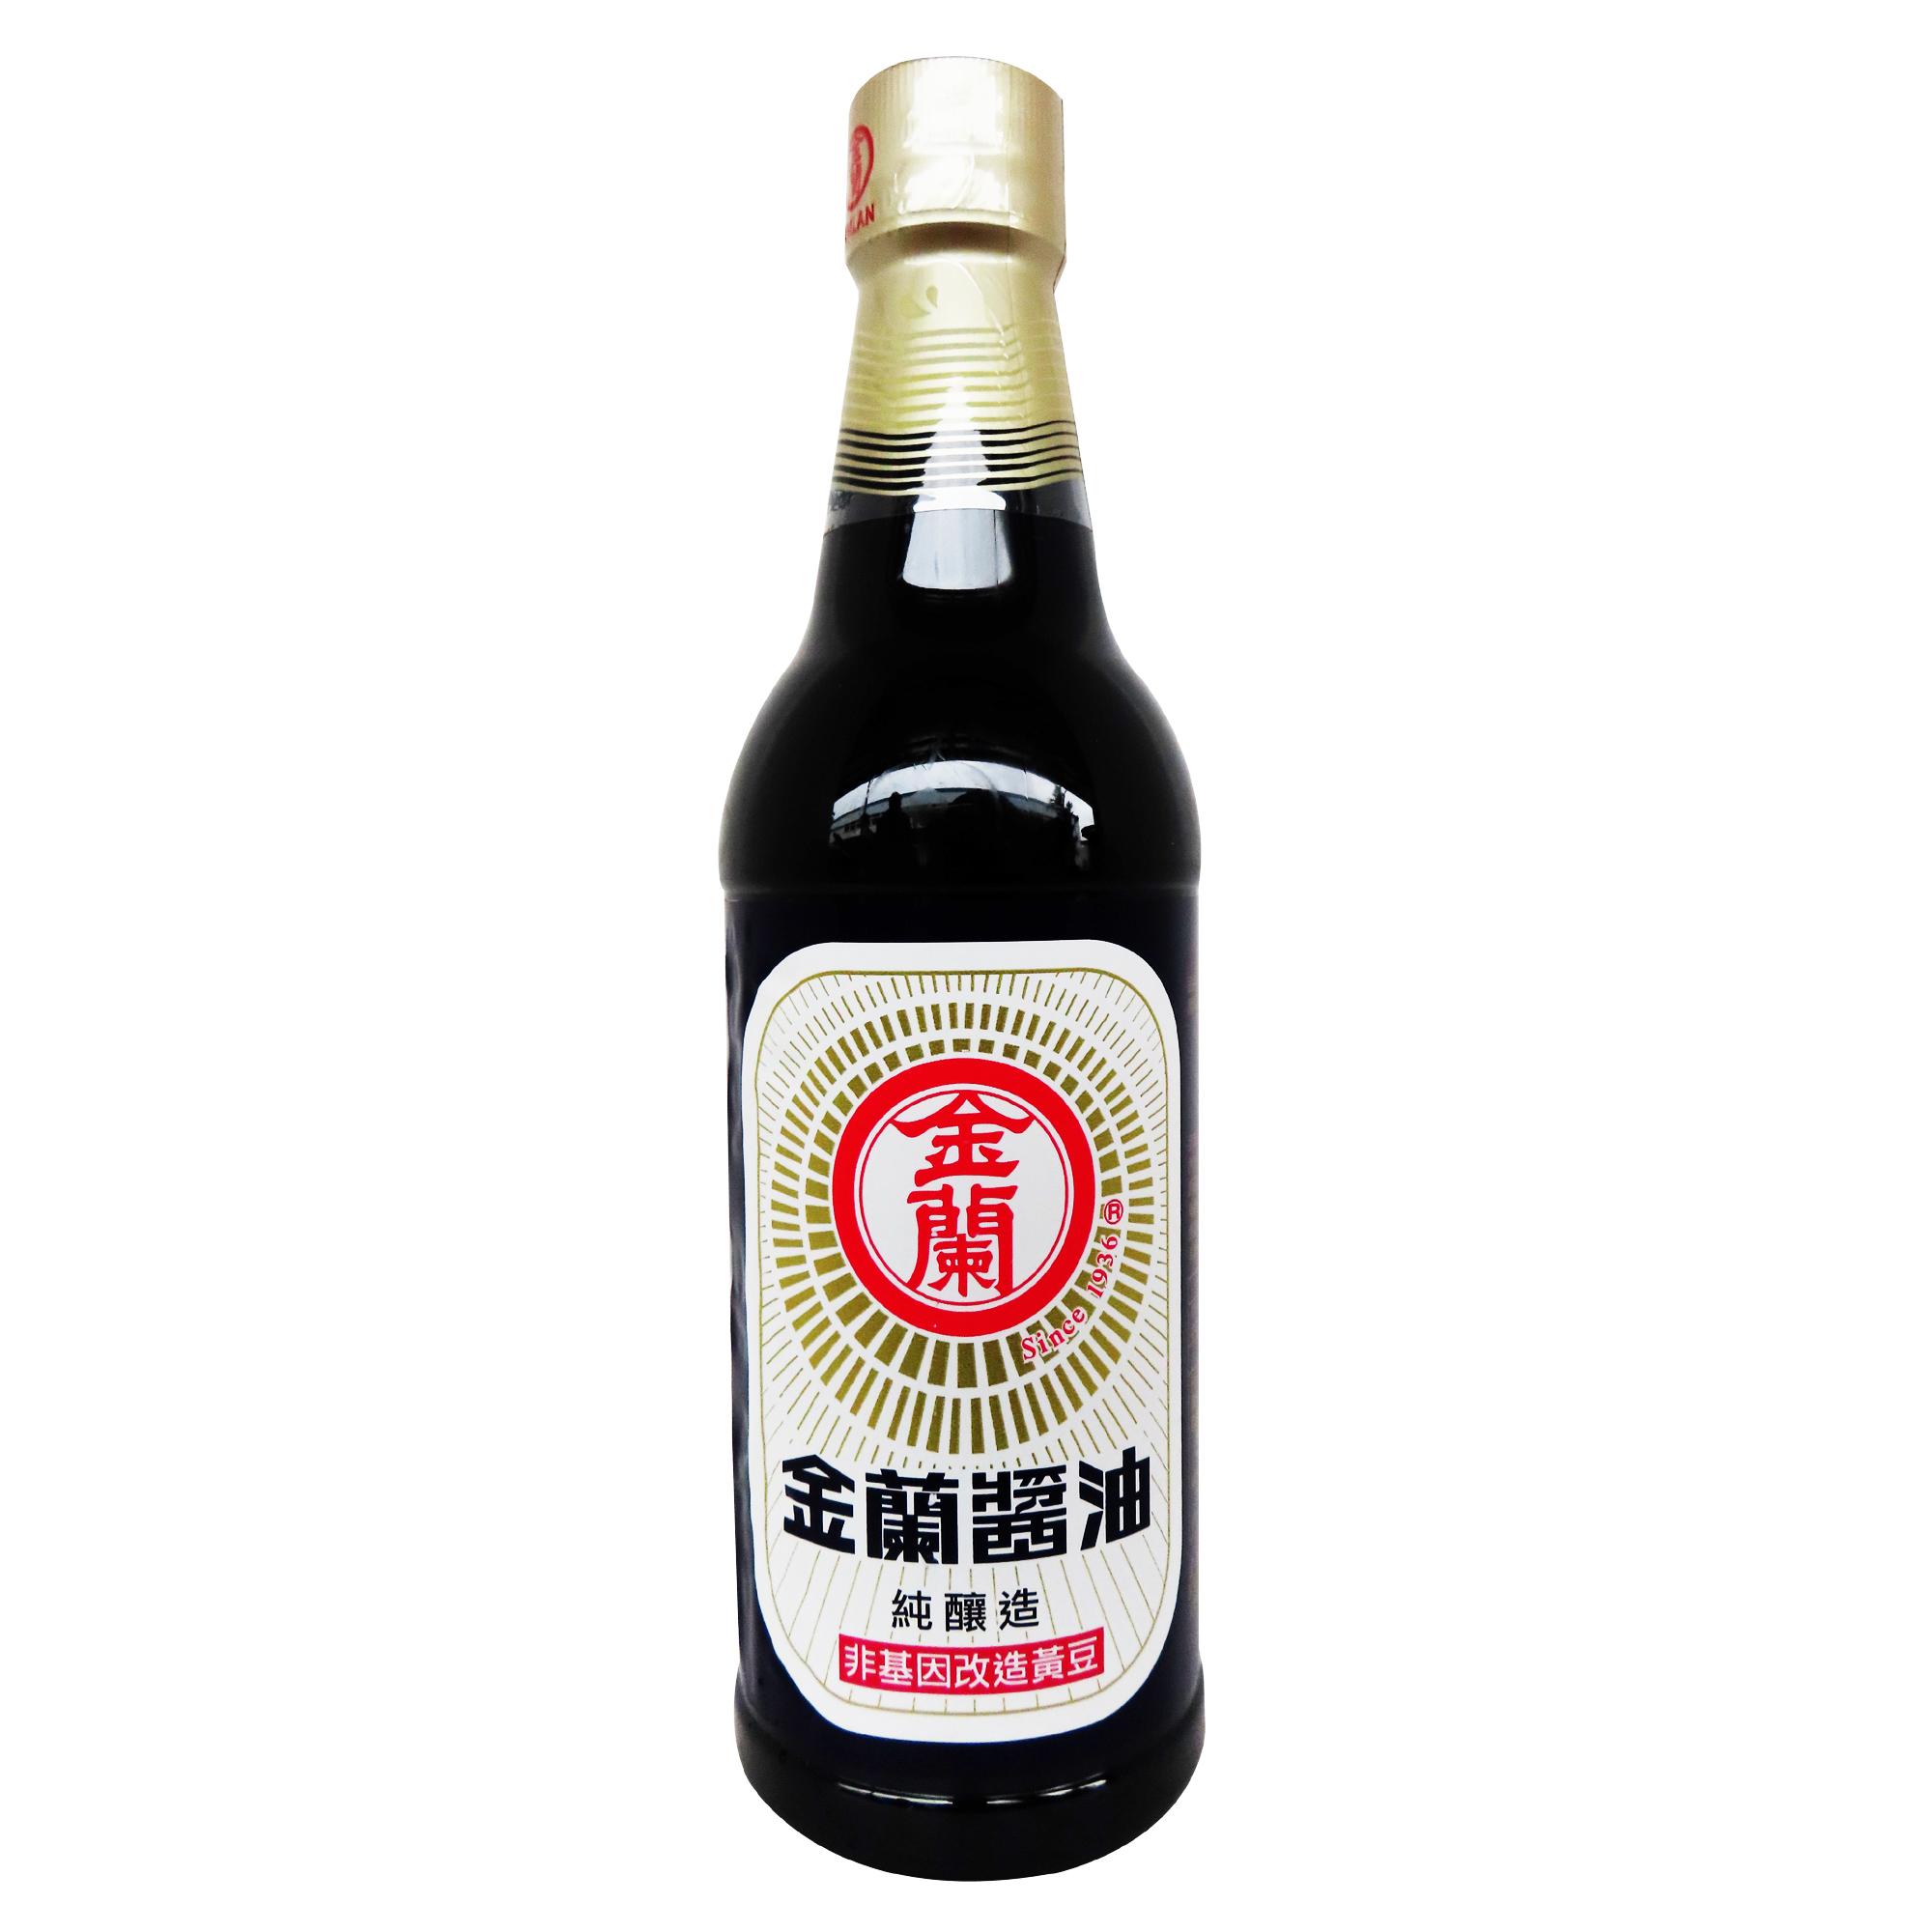 Image Kim Lan Soy Sauce 金兰-醬油 590 grams